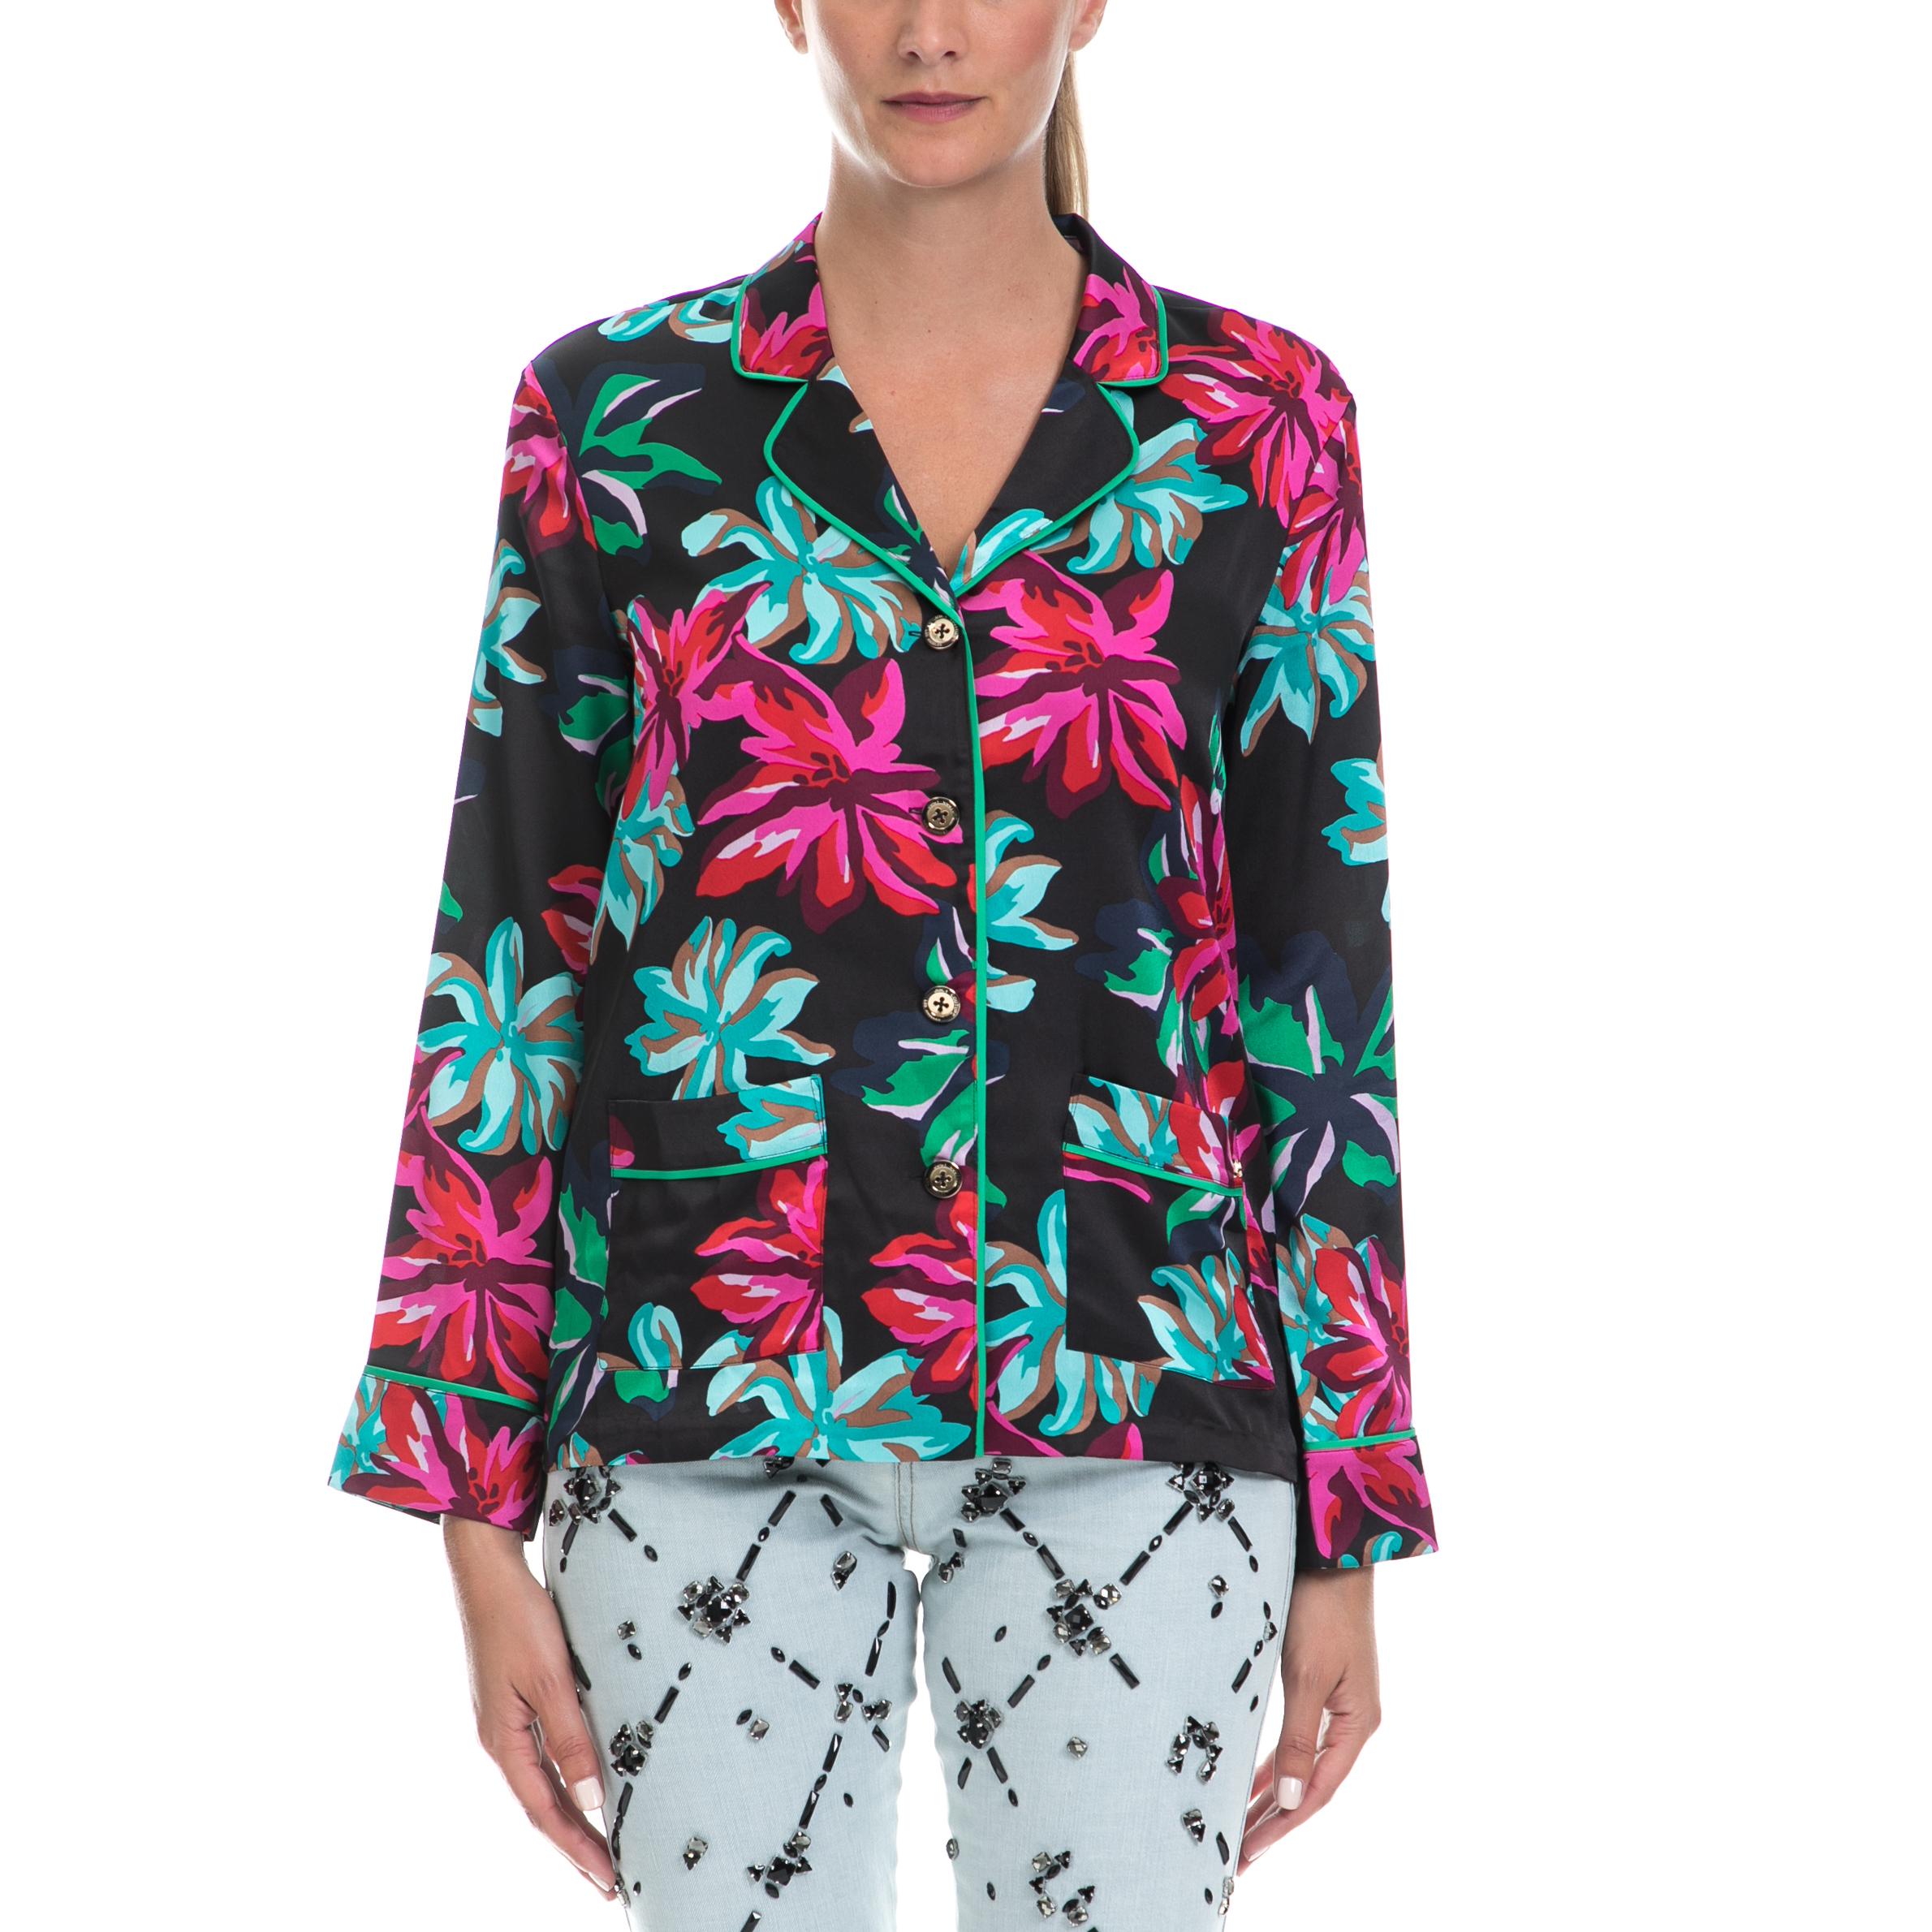 JUICY COUTURE - Γυναικείο σακάκι JUICY COUTURE εμπριμέ γυναικεία ρούχα πανωφόρια σακάκια